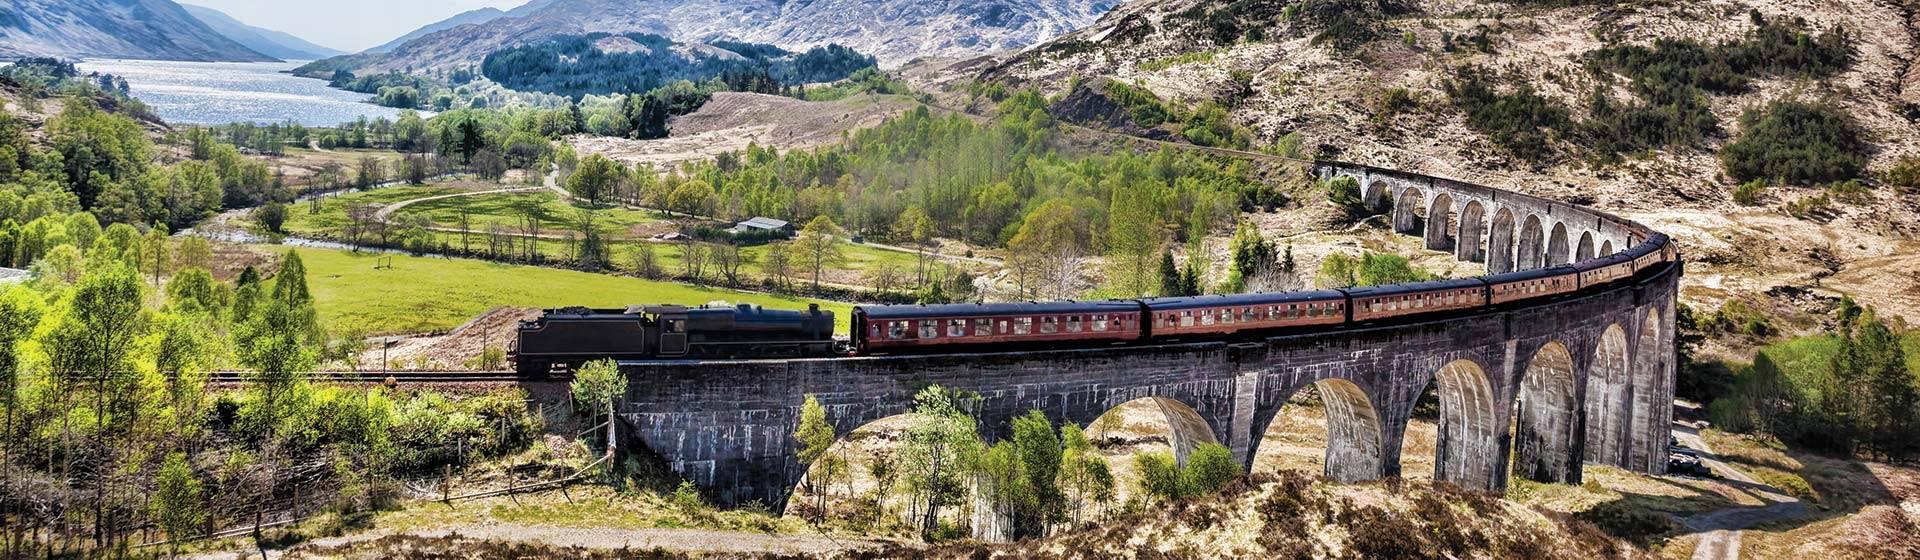 Royals & Rails in Scotland